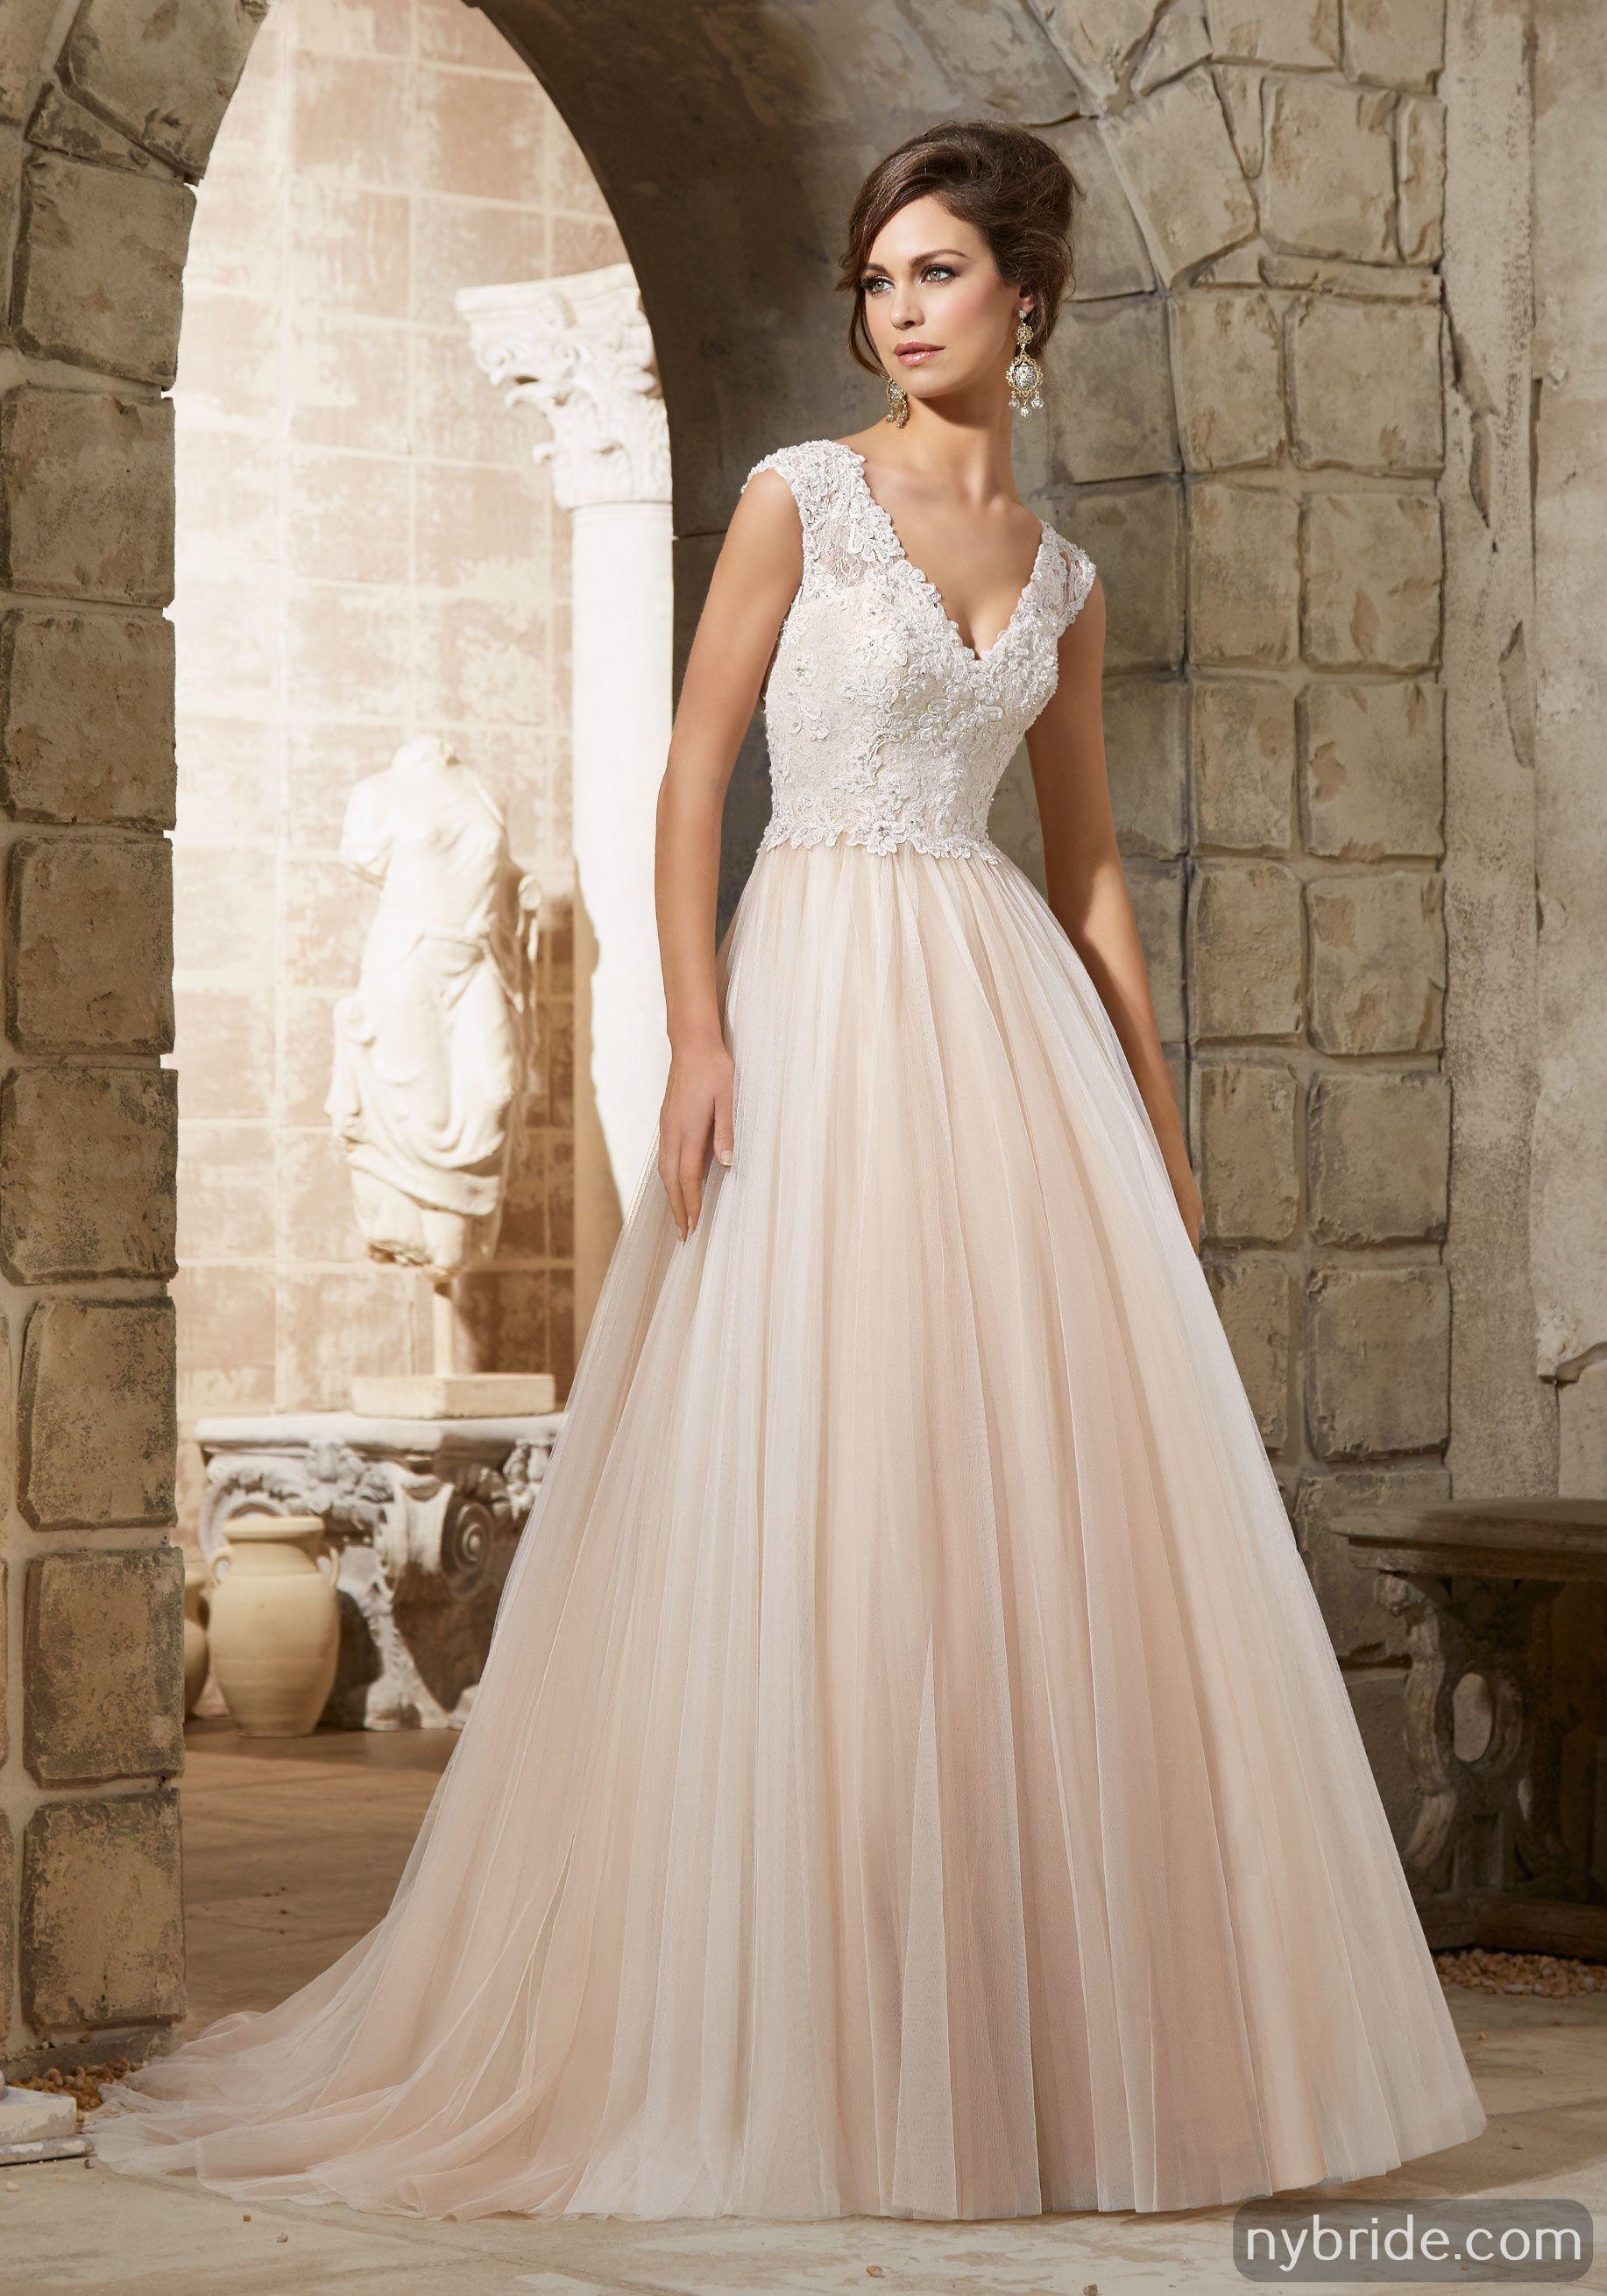 Wedding Dress Shop Wedding Dresses Groom Wedding Dress Wedding Dress Shopping